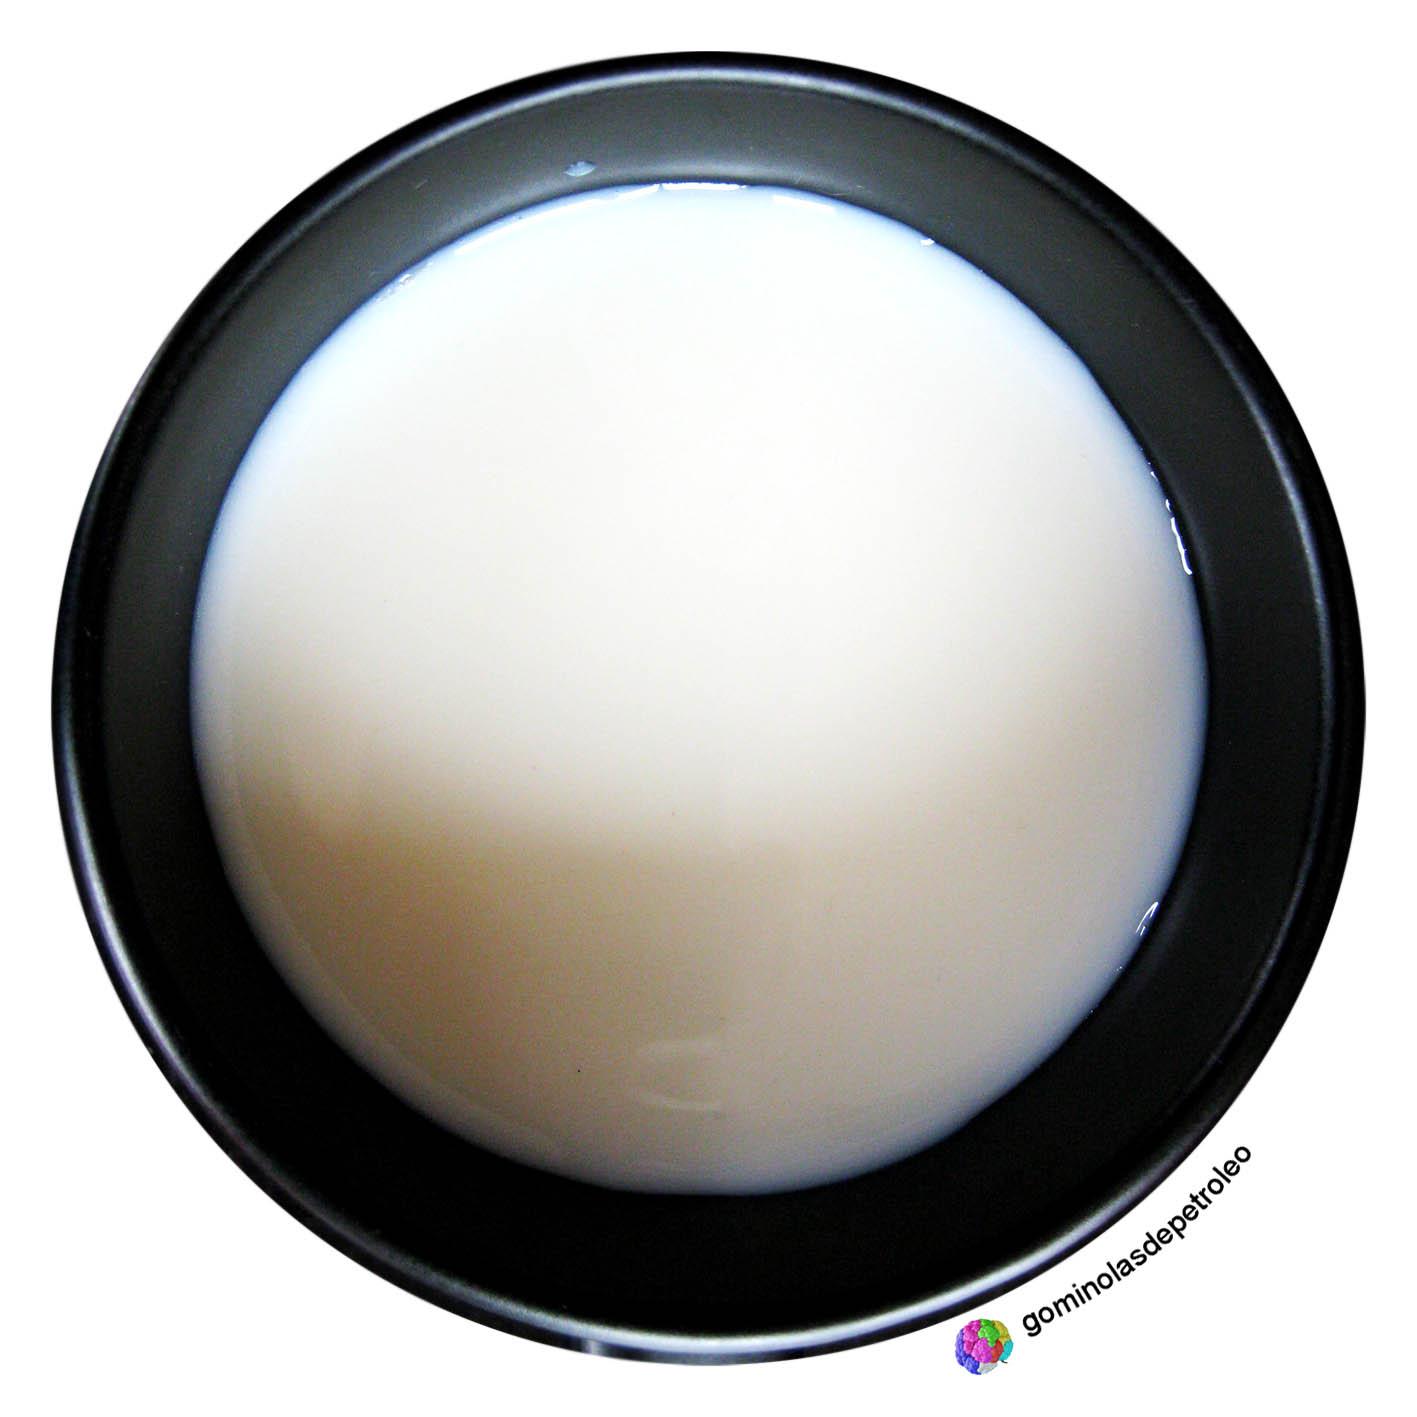 gominolasdepetroleo Cmo se procesa la leche